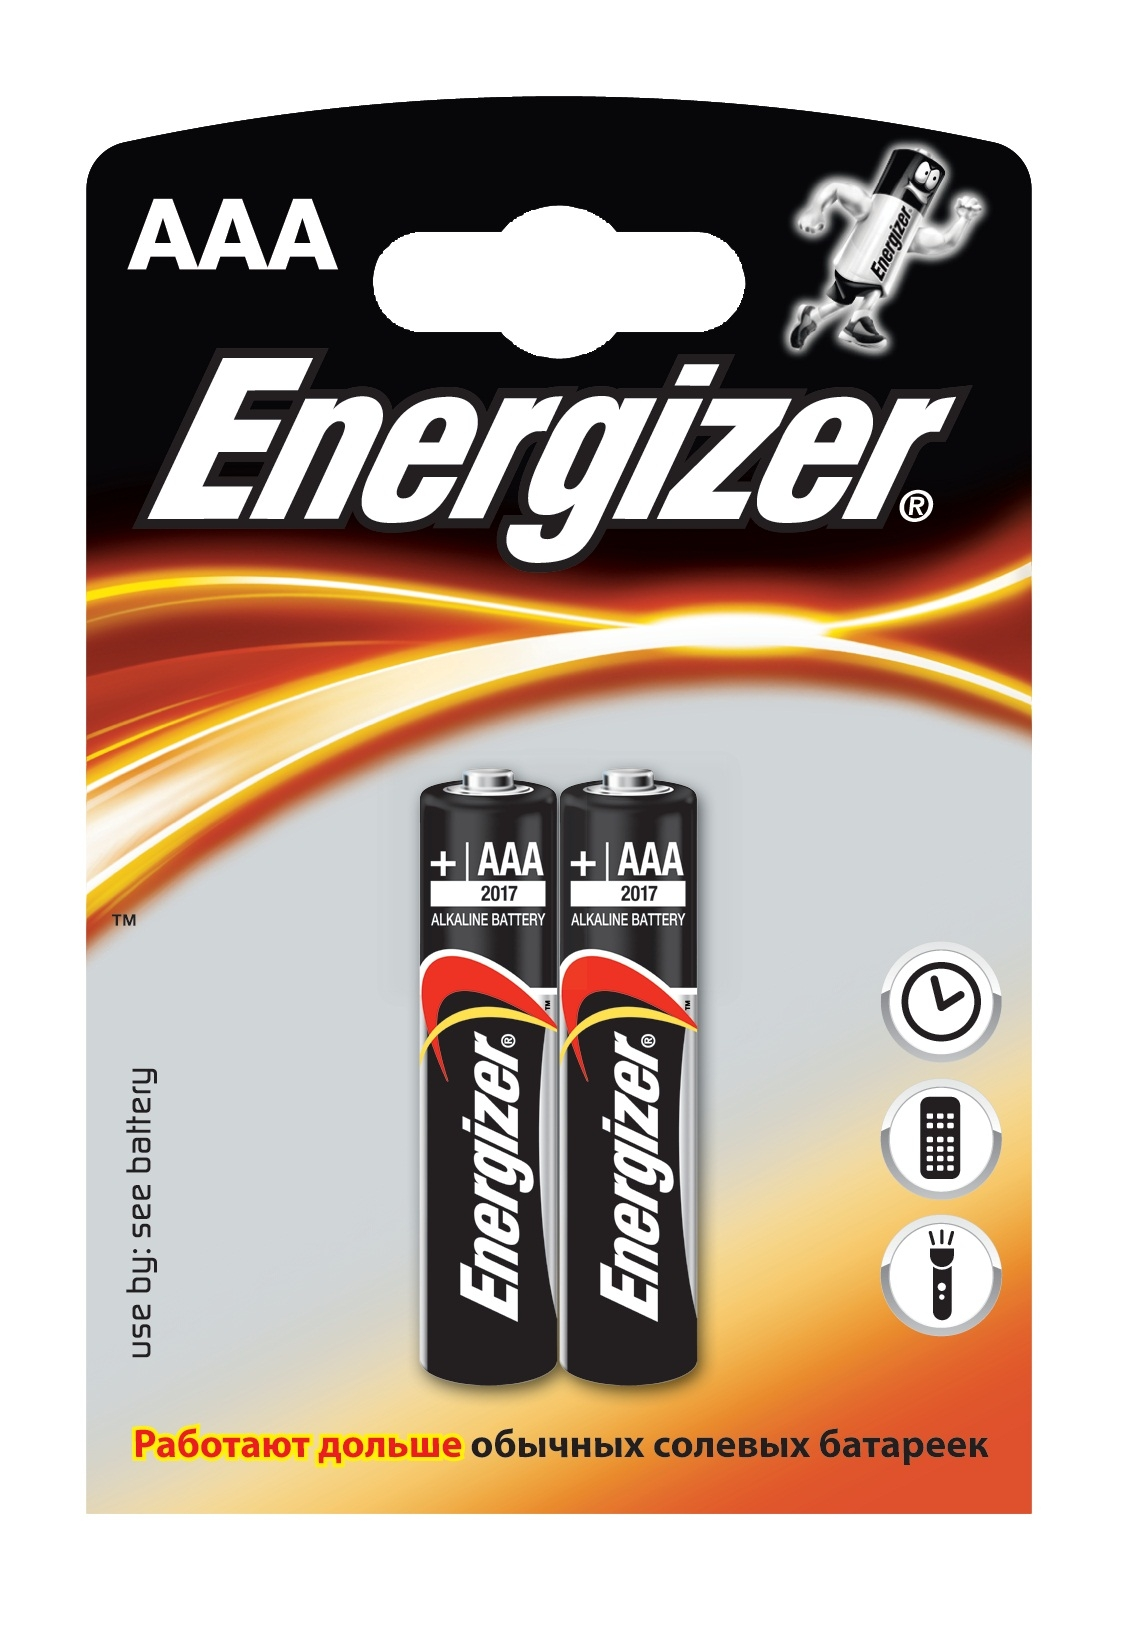 Элементы питания Energizer Элемент питания Energizer AAA 2 шт. батарейка energizer base aaa multi blister 20 шт